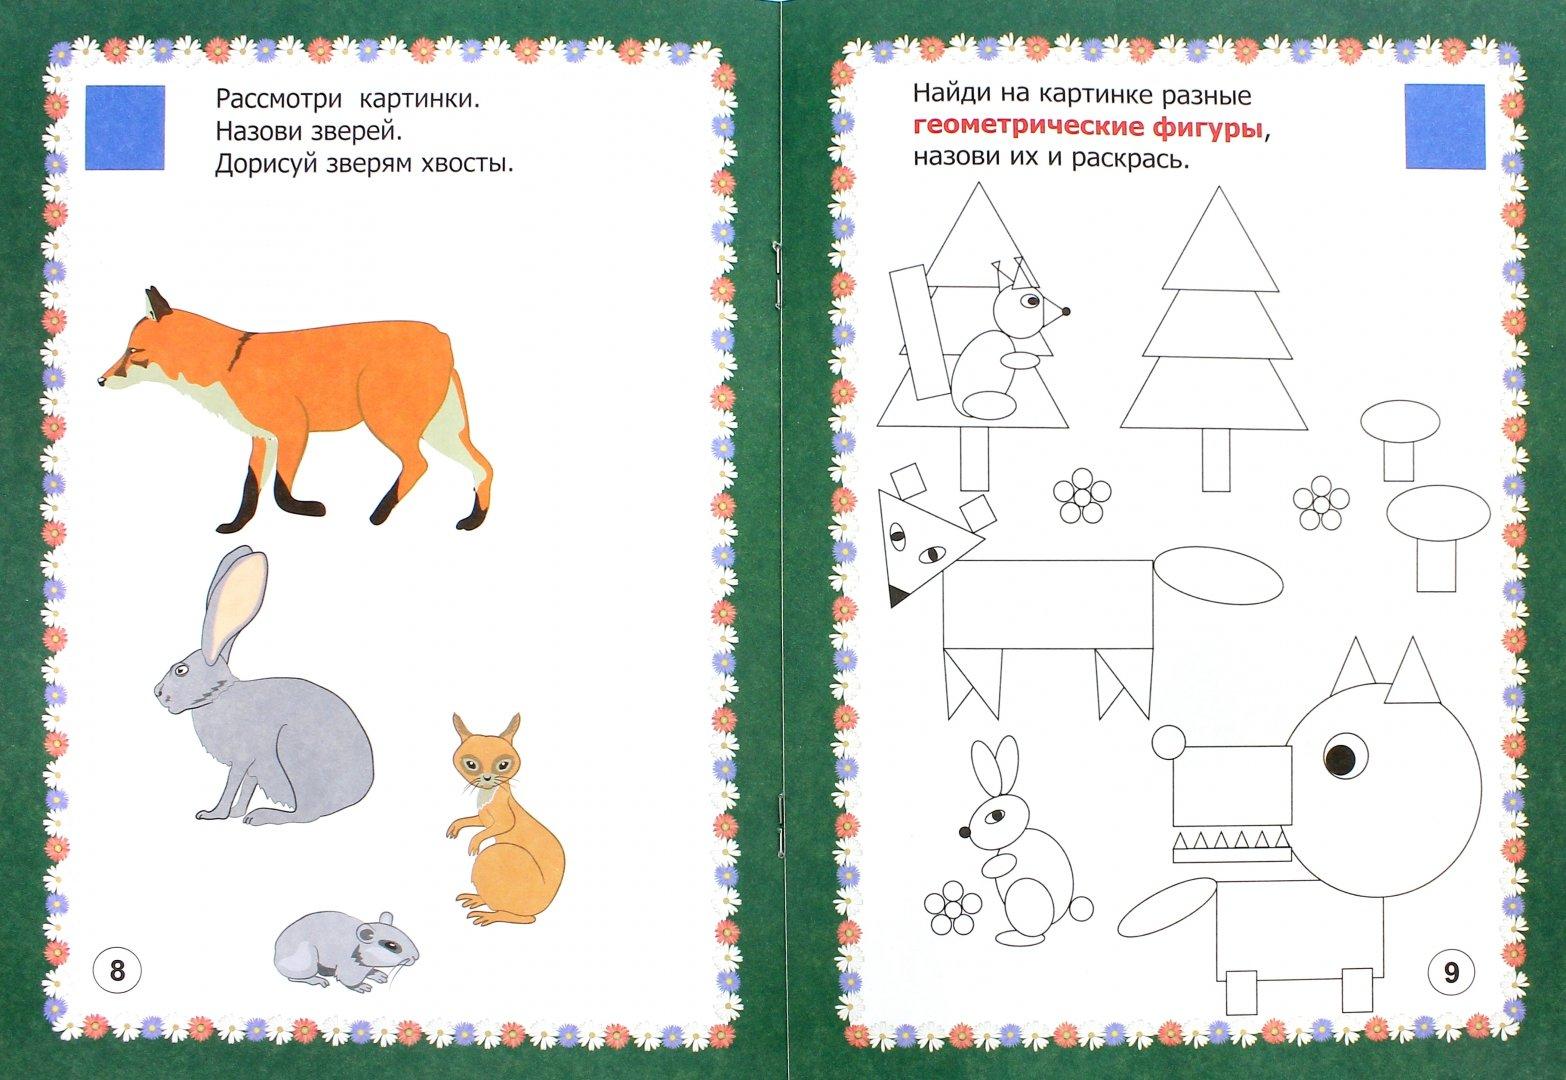 математика картинки животных наличии покраснения